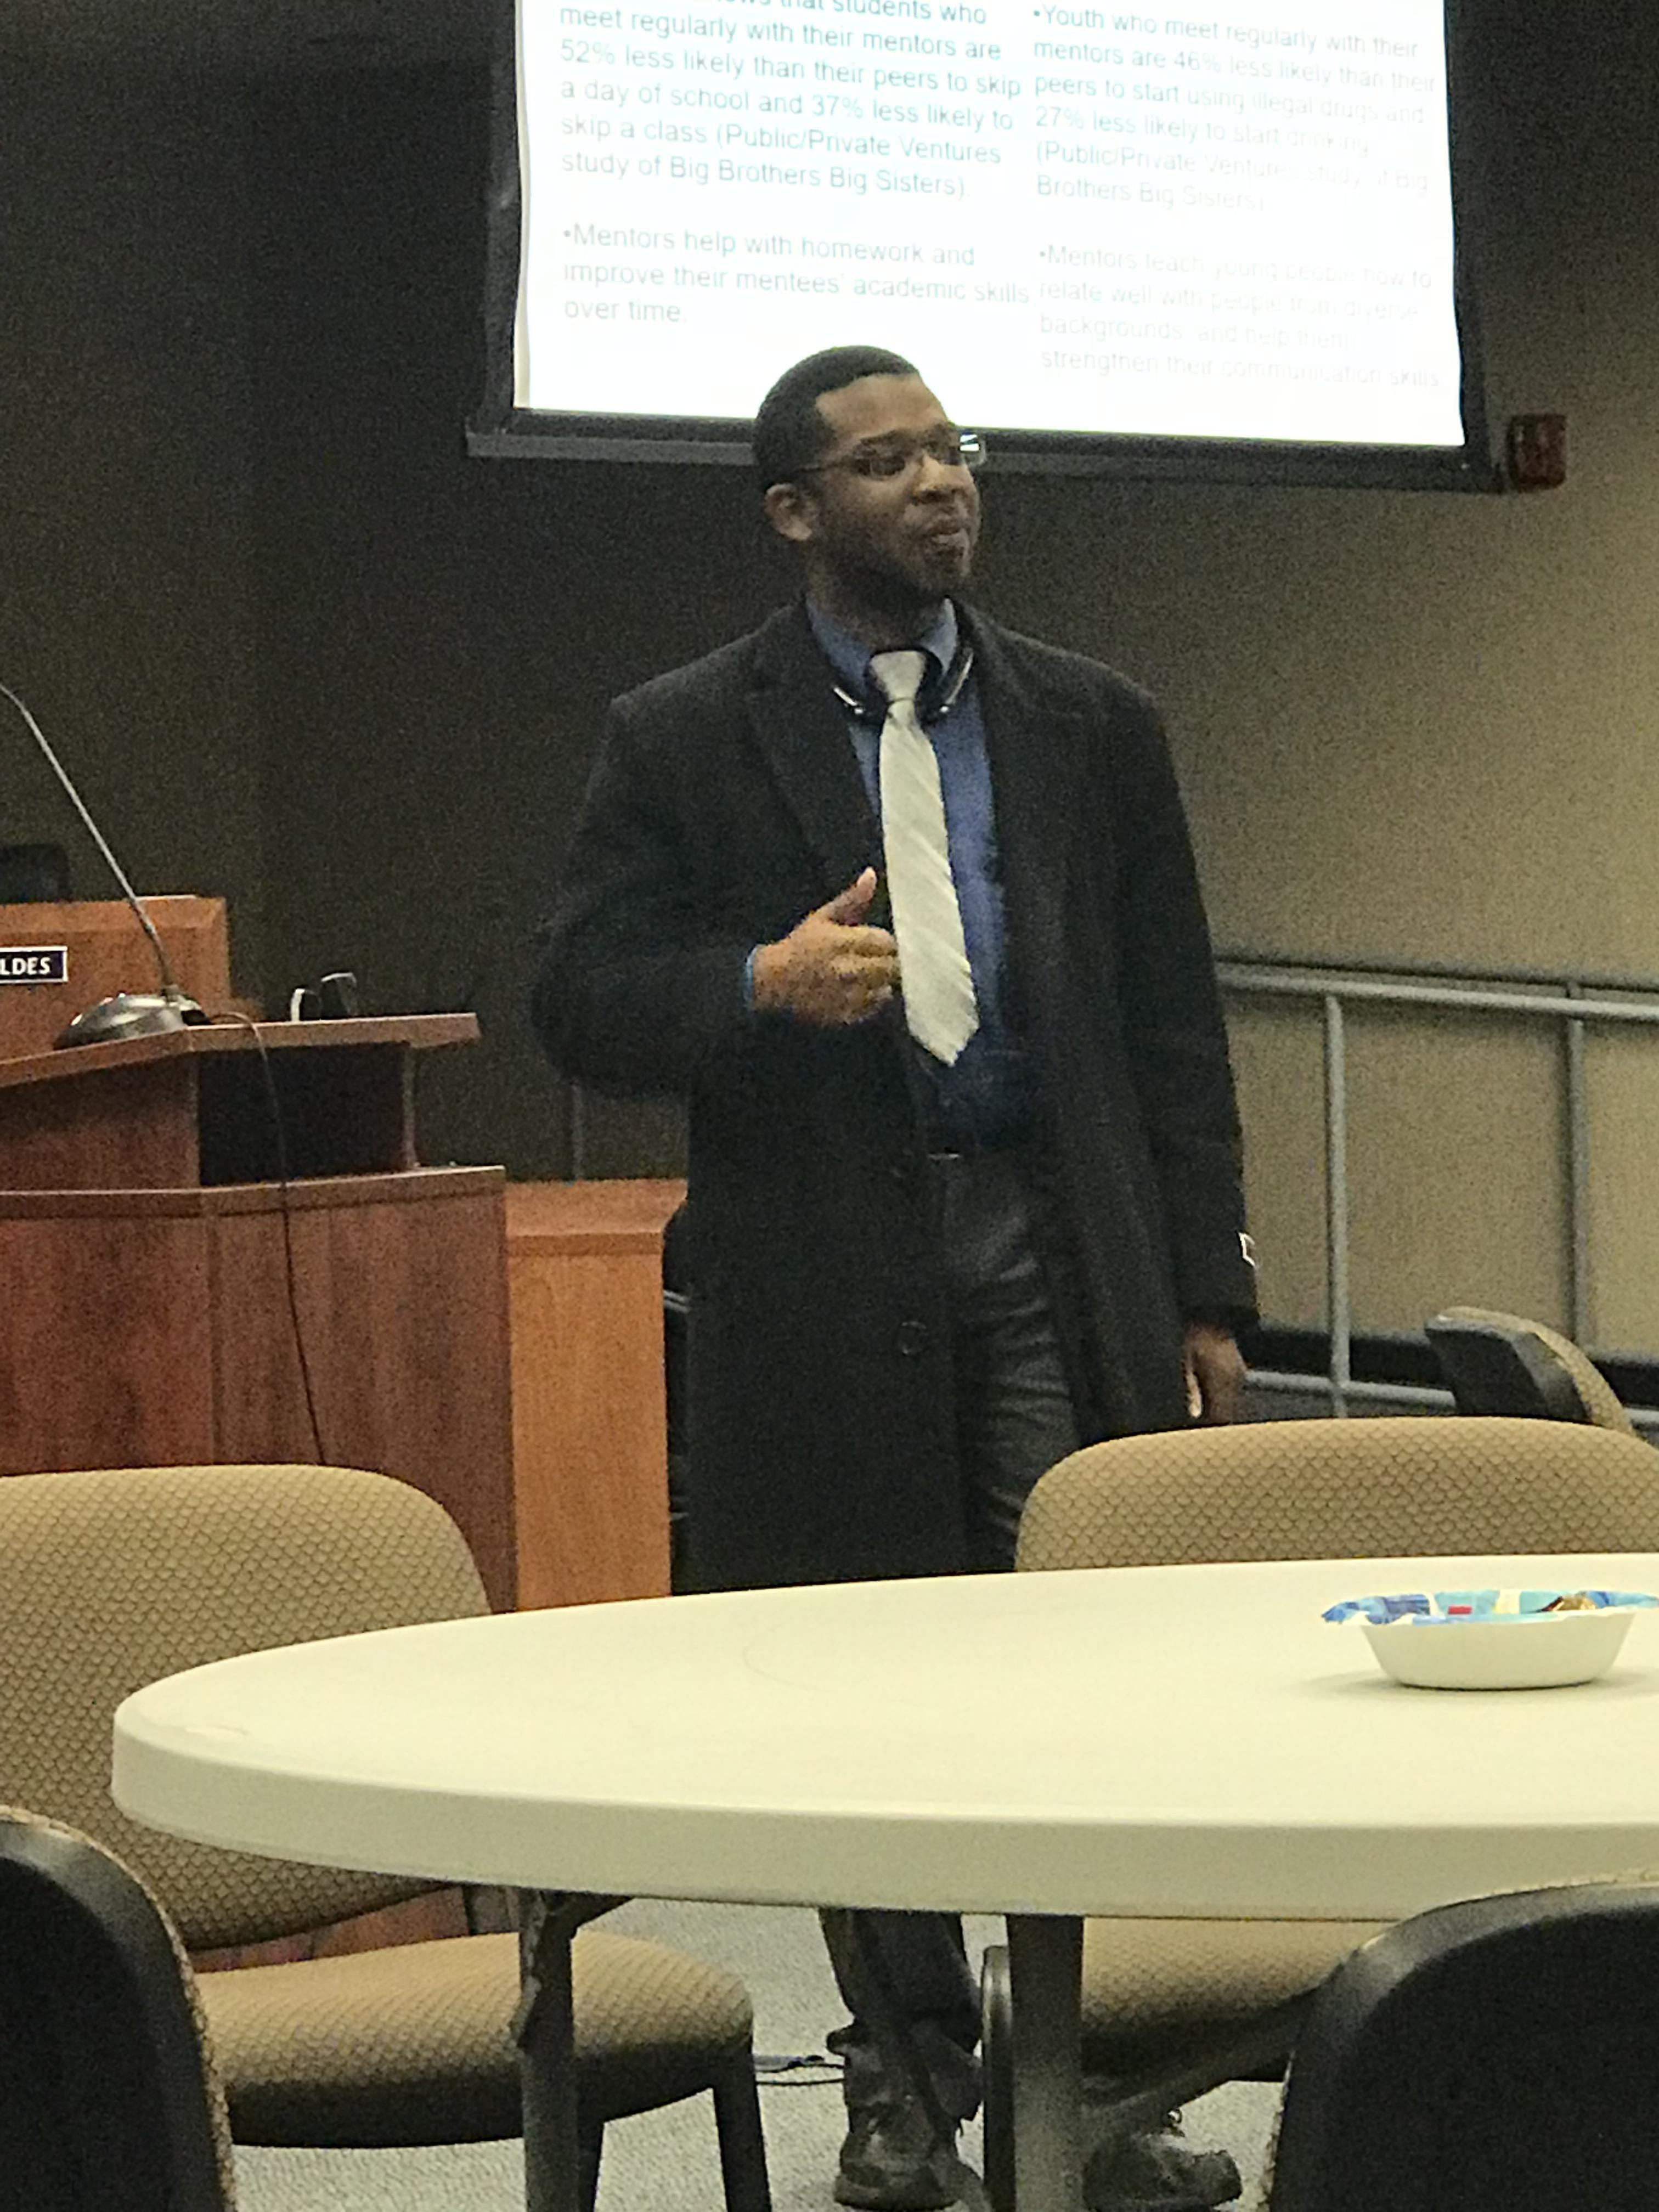 Corey Jackson speaking about Sigma Beta Xi.